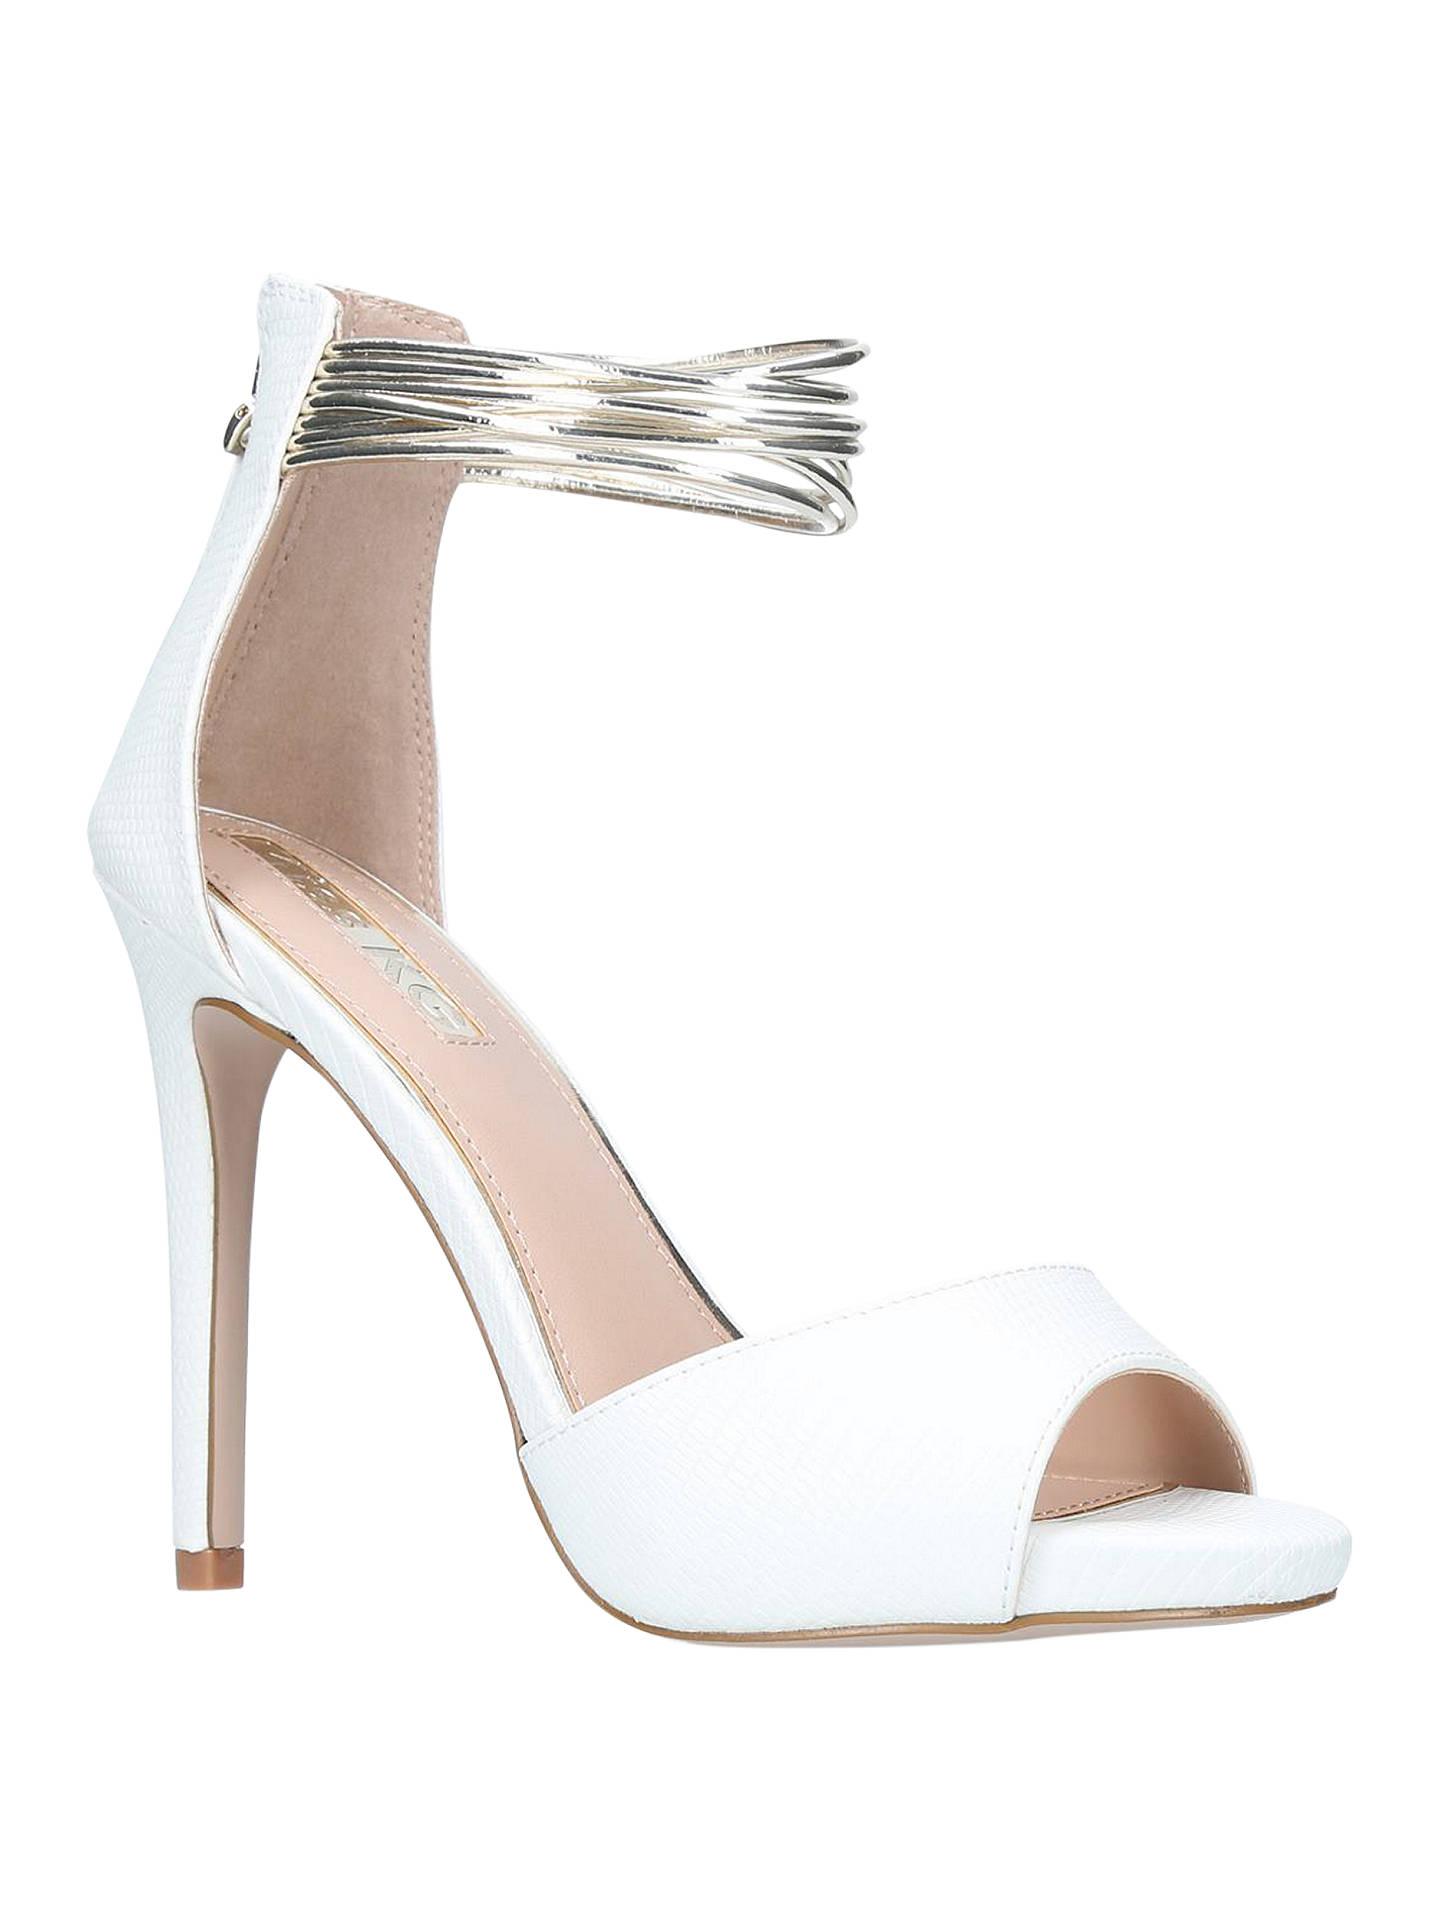 Buy Miss KG White Elle Sandals from the Next UK online shop